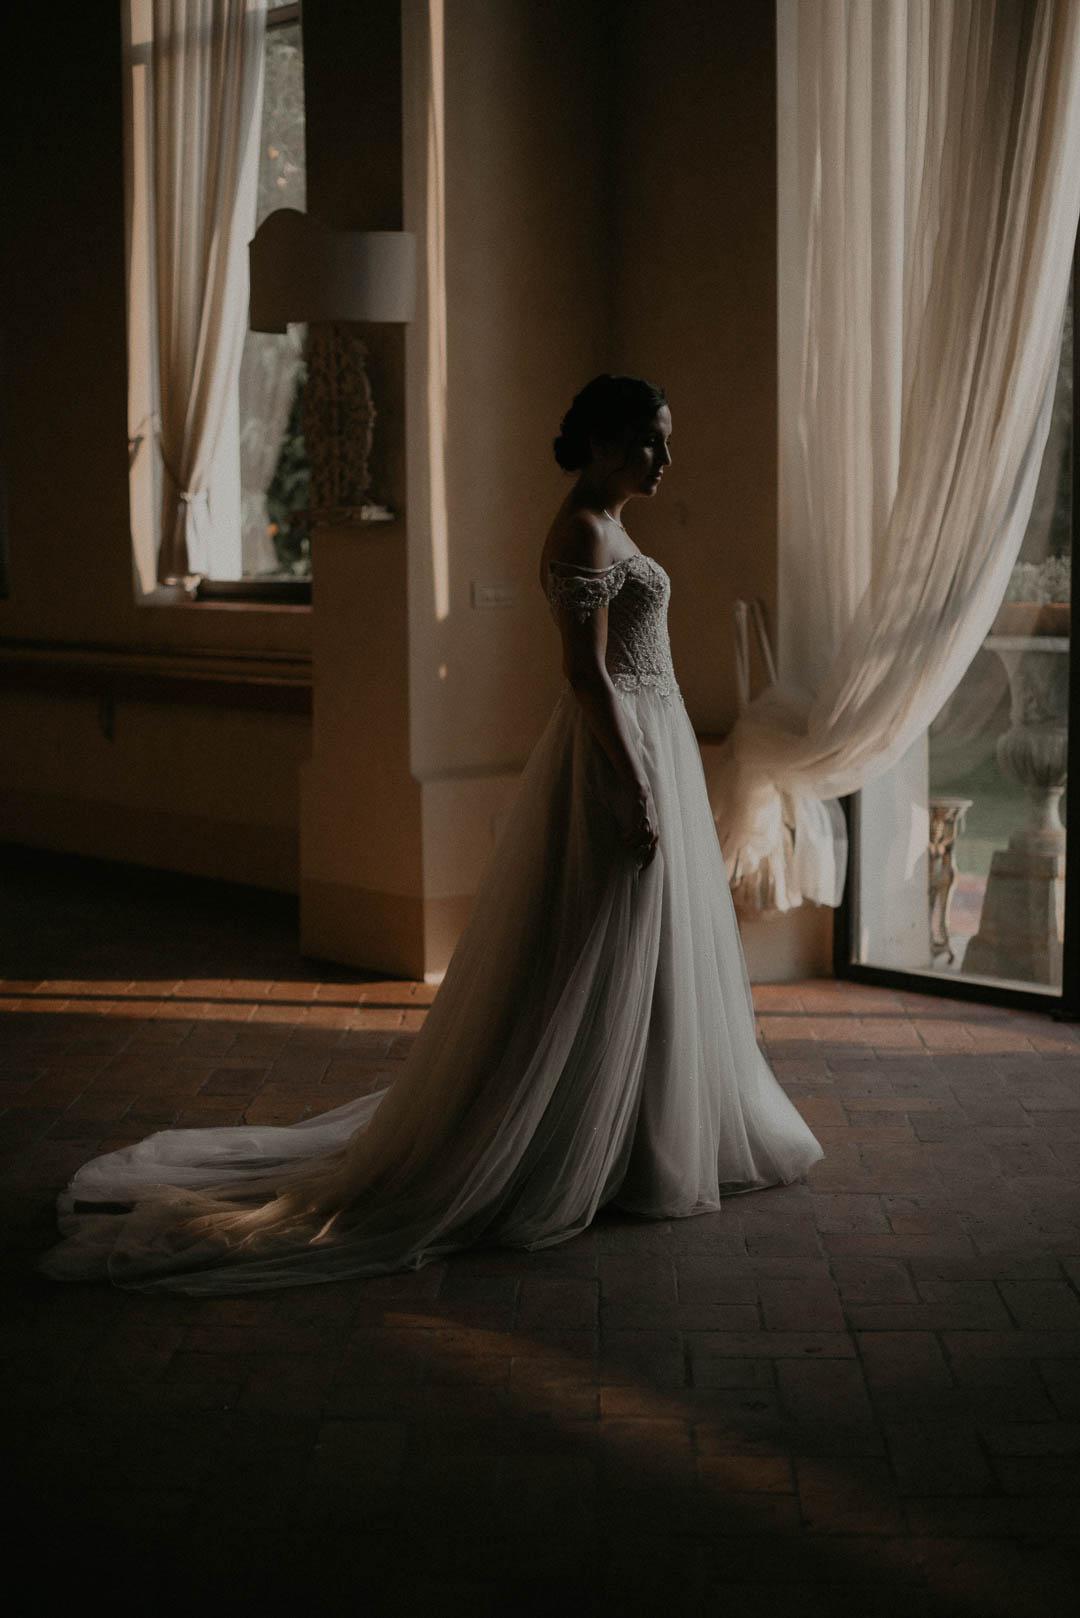 wedding-photographer-destination-fineart-bespoke-reportage-tuscany-villascorzi-vivianeizzo-spazio46-116